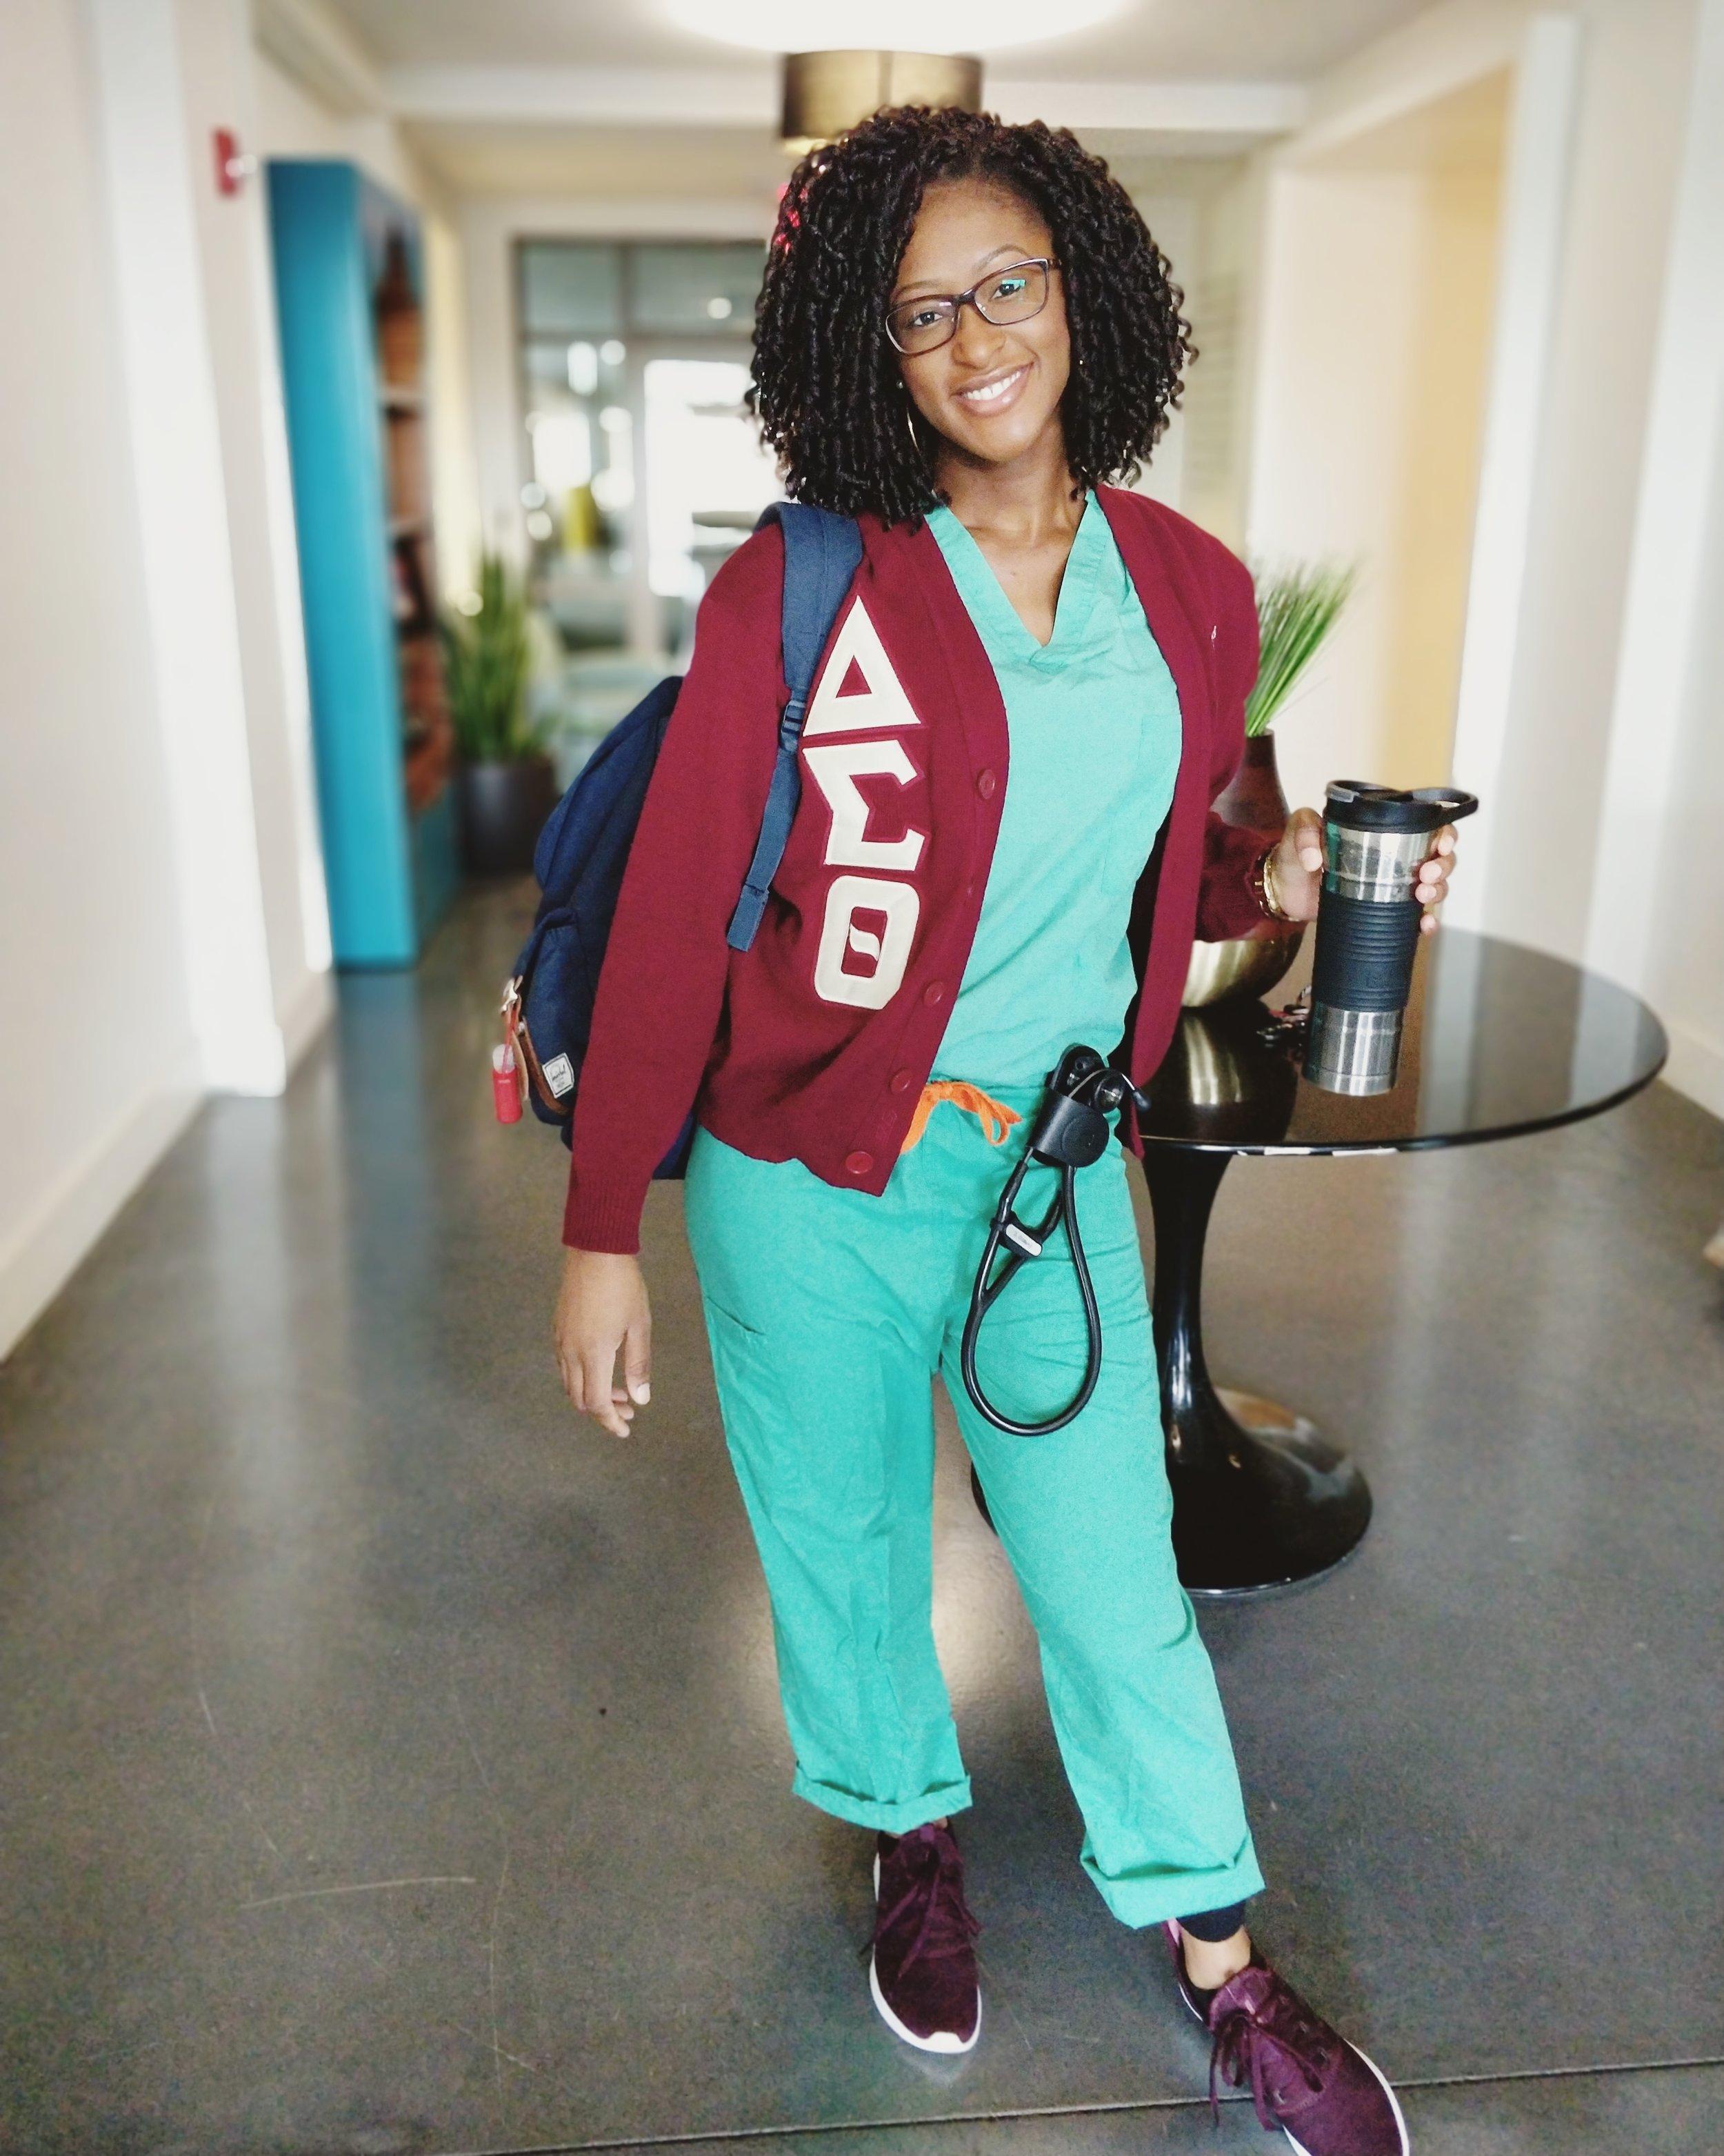 Damilola Olatunji, MS, MD Candidate & SNMA National Treasurer (2018-2019)